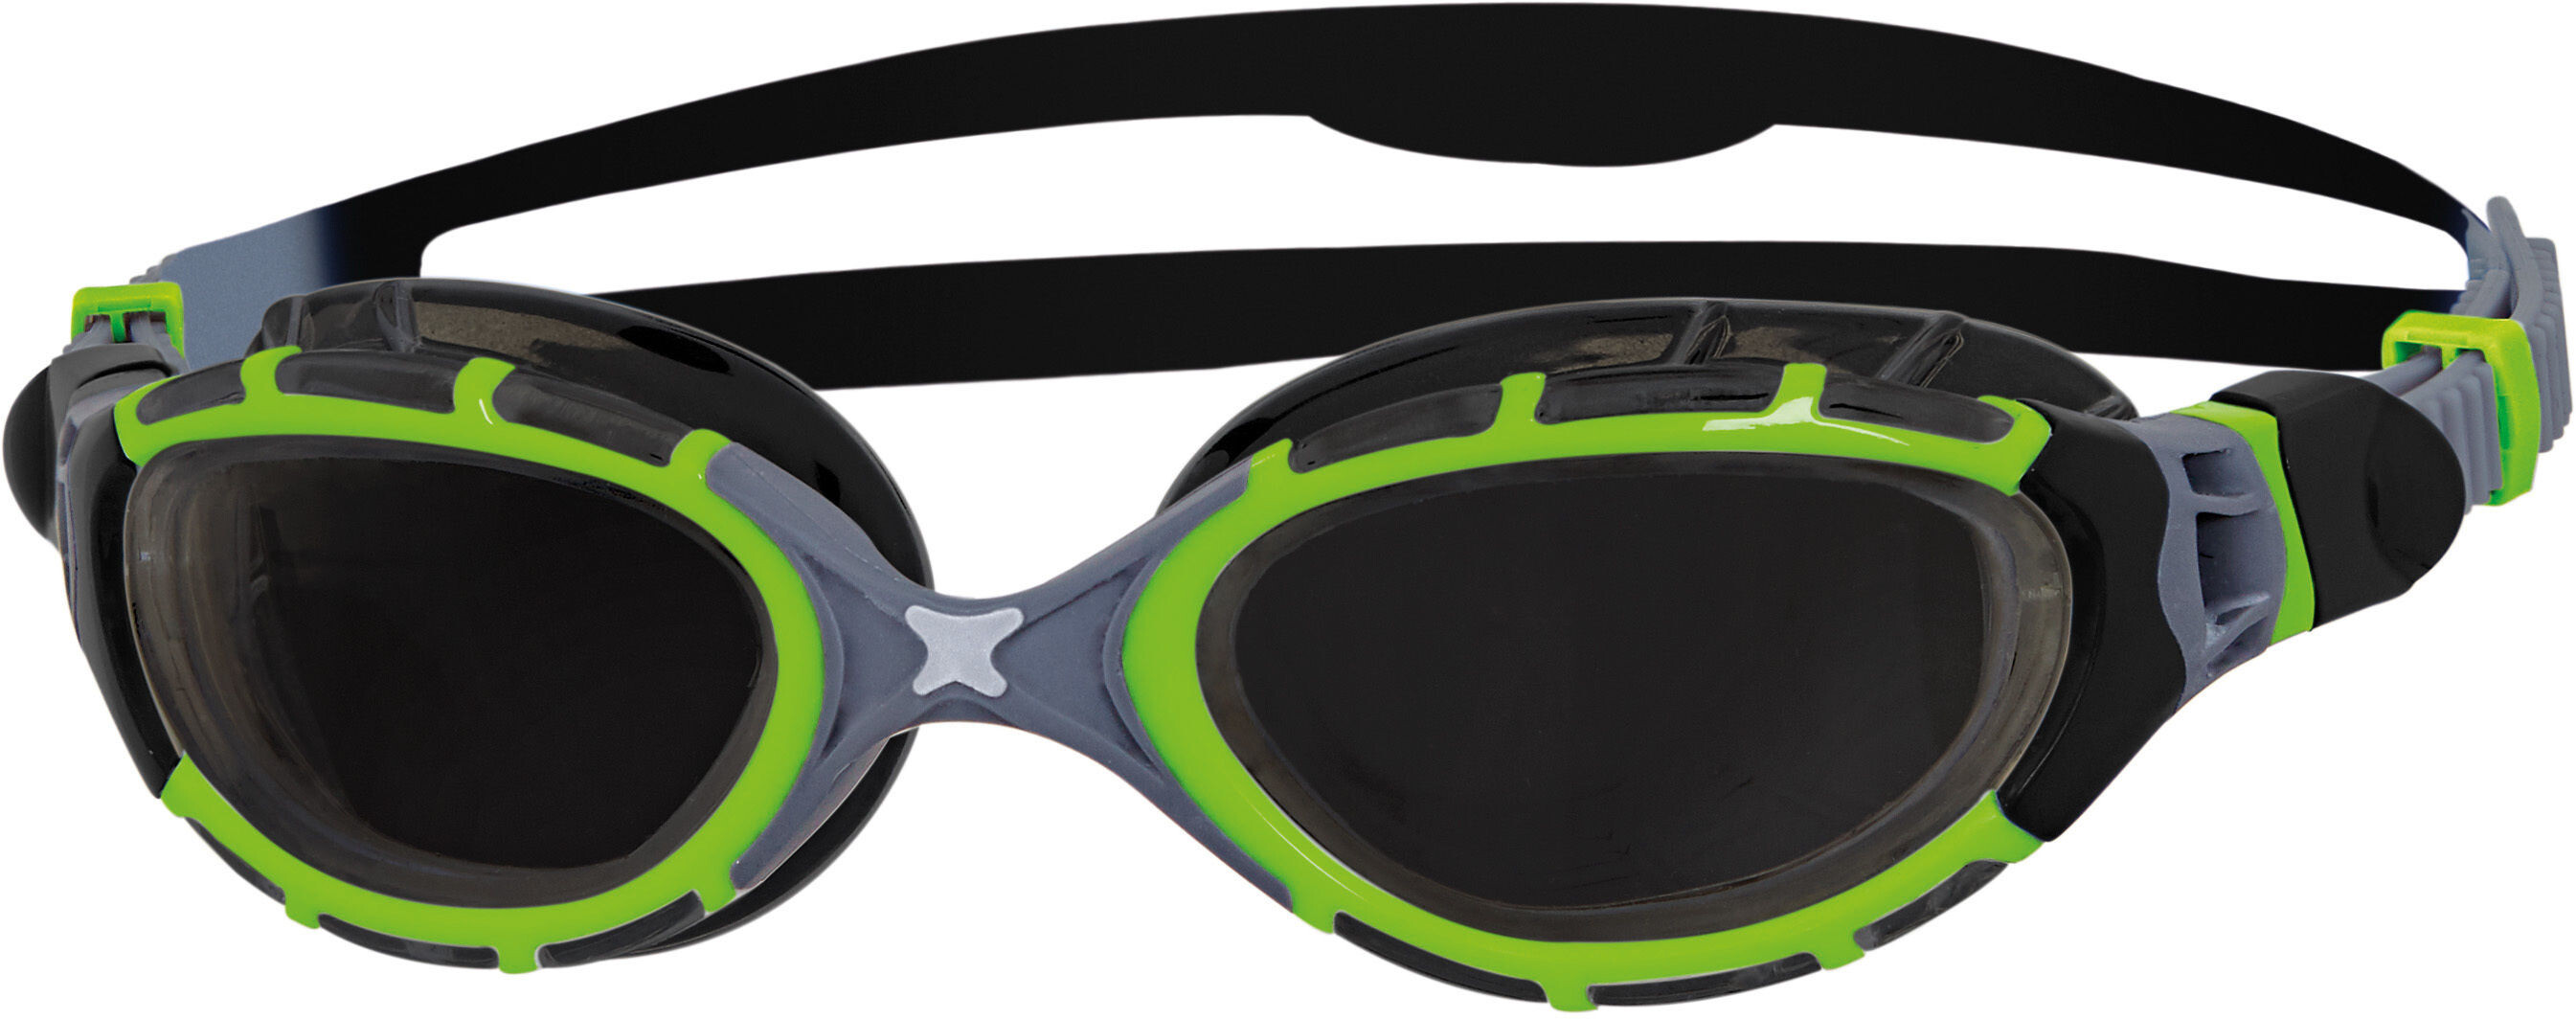 Zoggs Predator Flex - Lunettes de natation - Titanium Reactor vert noir fd1054bf221e